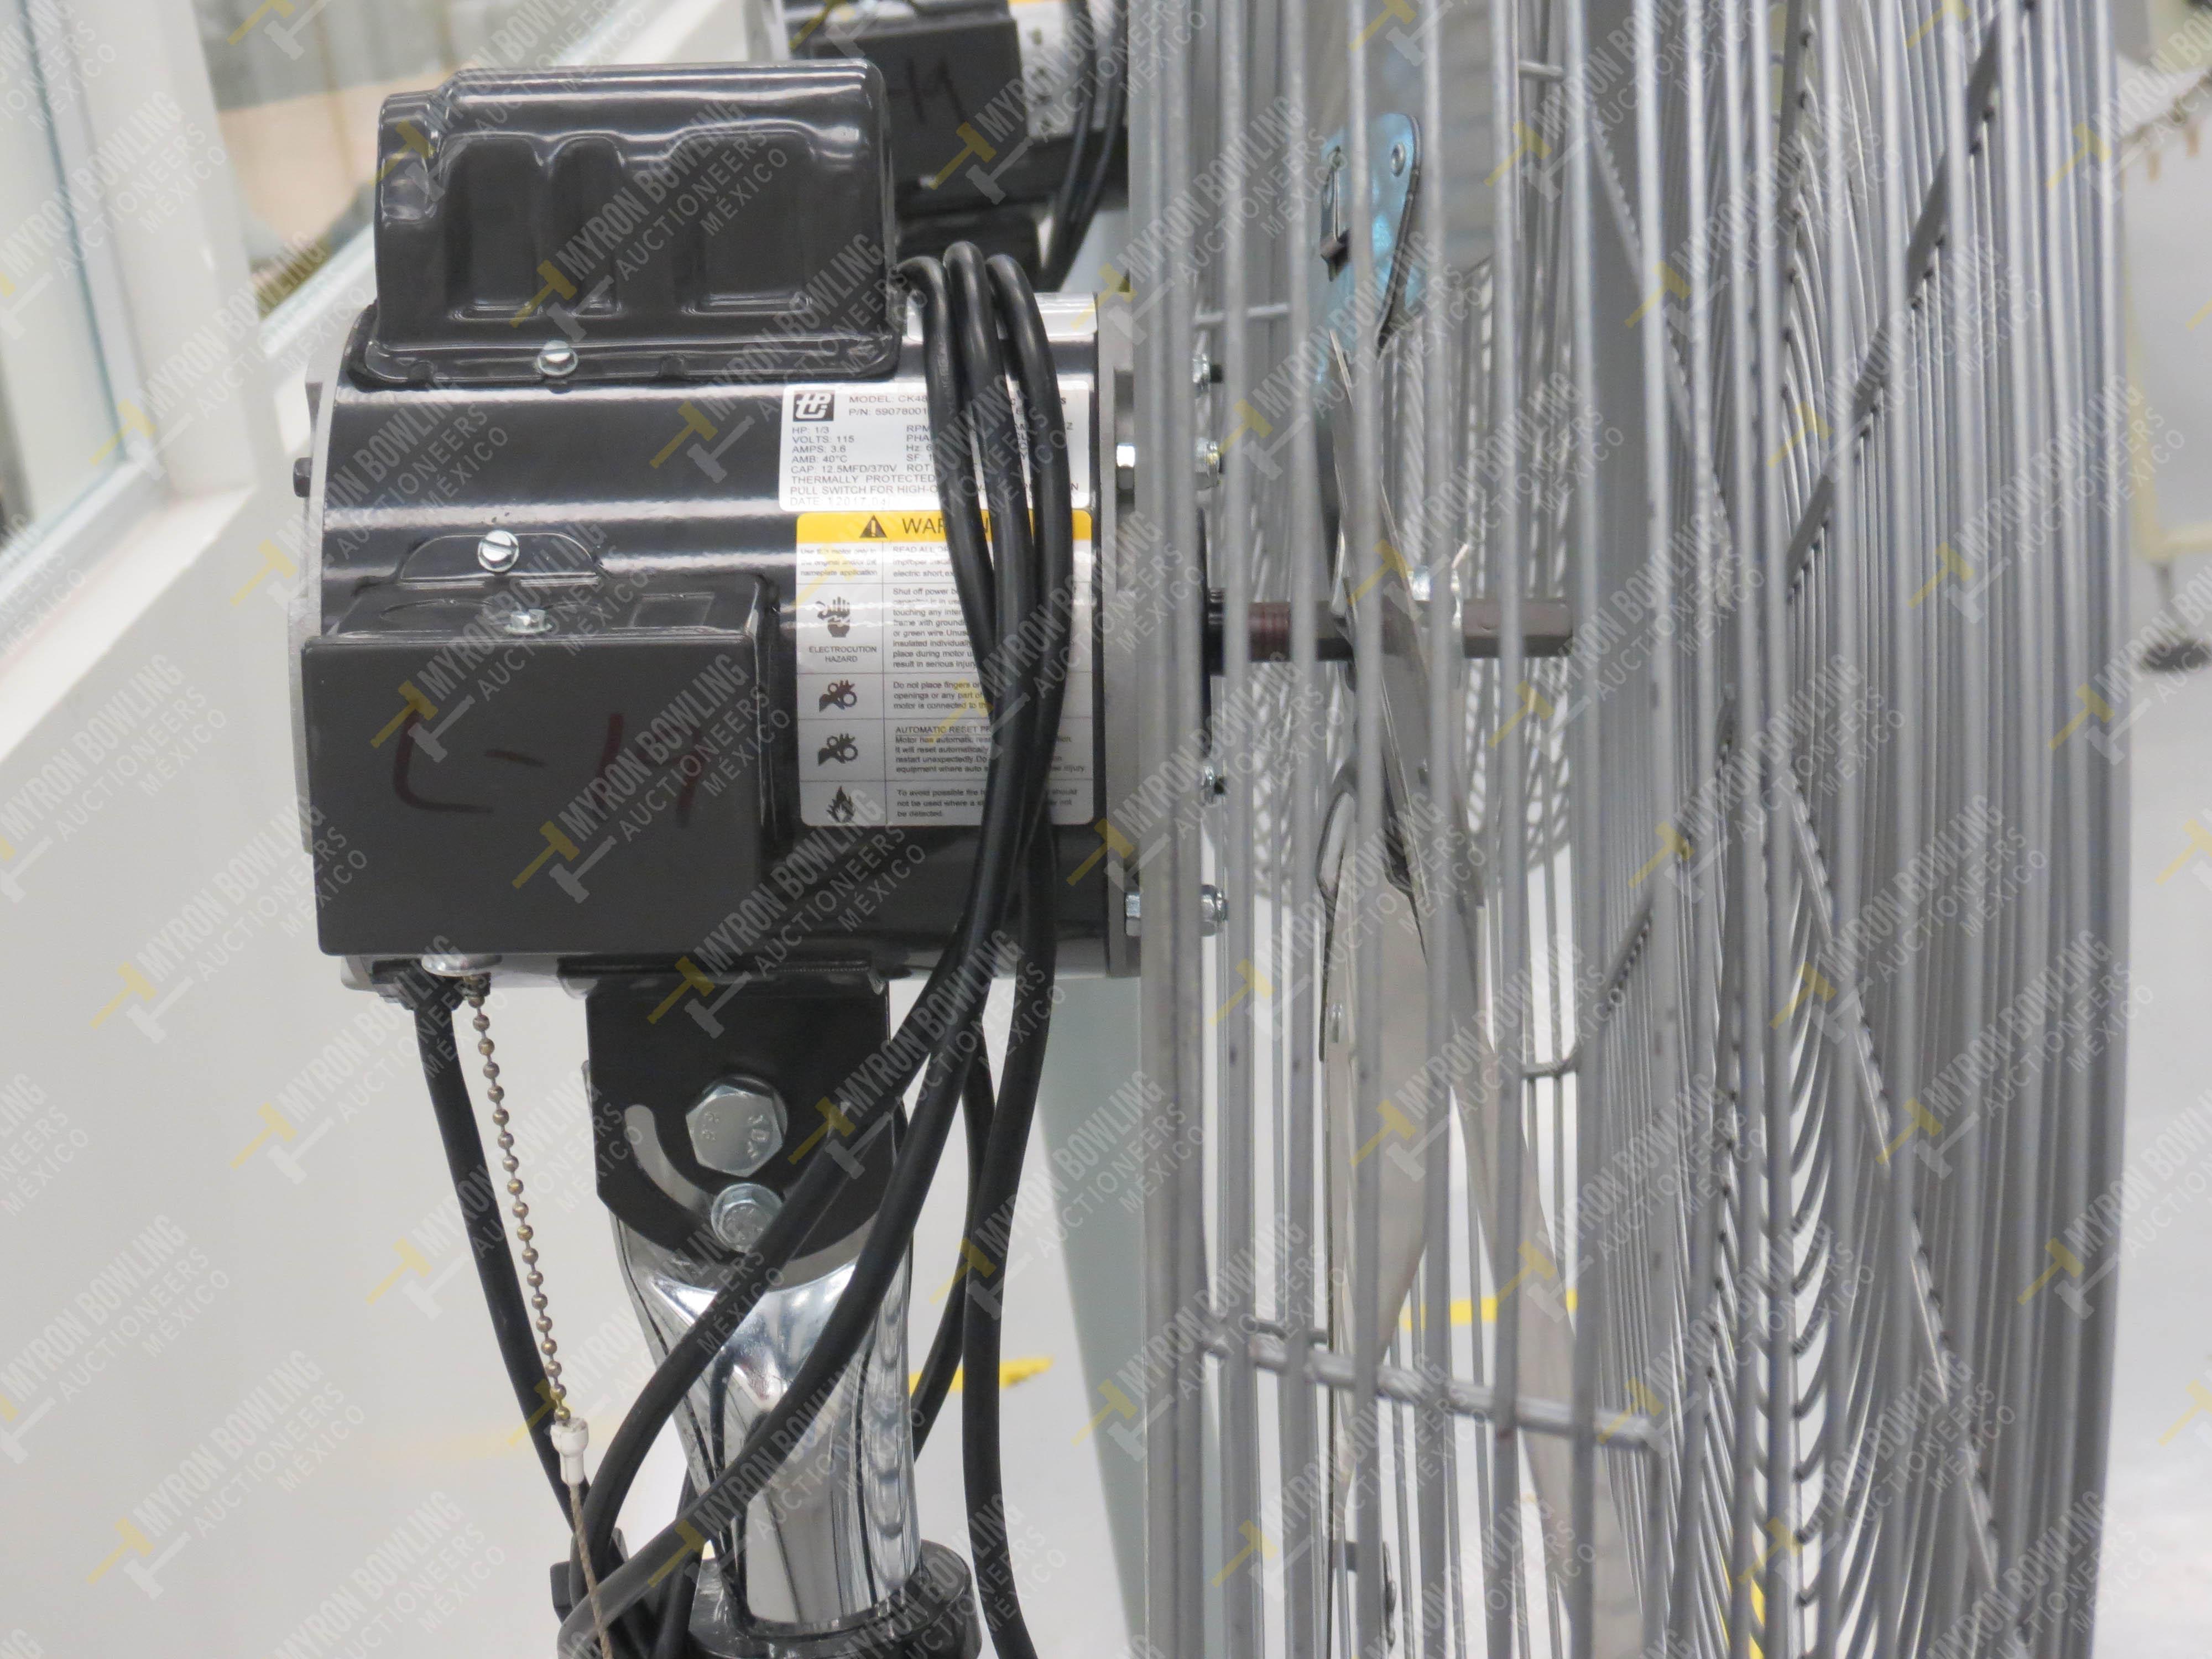 Ventilador de pedestal de 80 cm de diámetro marca TPI Industrial, Modelo CK48HF12JS26, … - Image 4 of 4